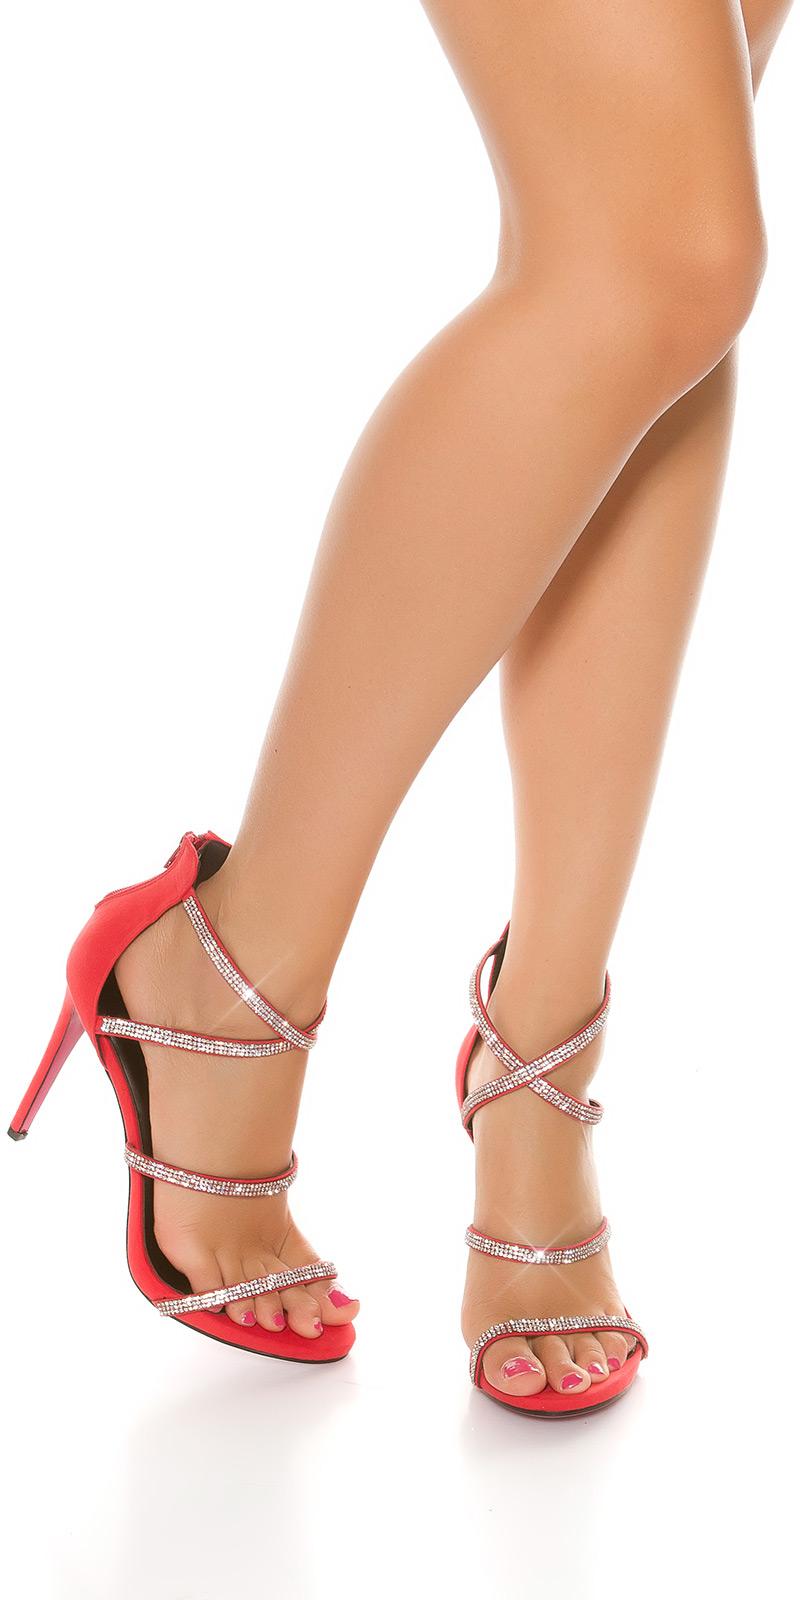 Sandale Sexy Sling cu toc cu strasuri